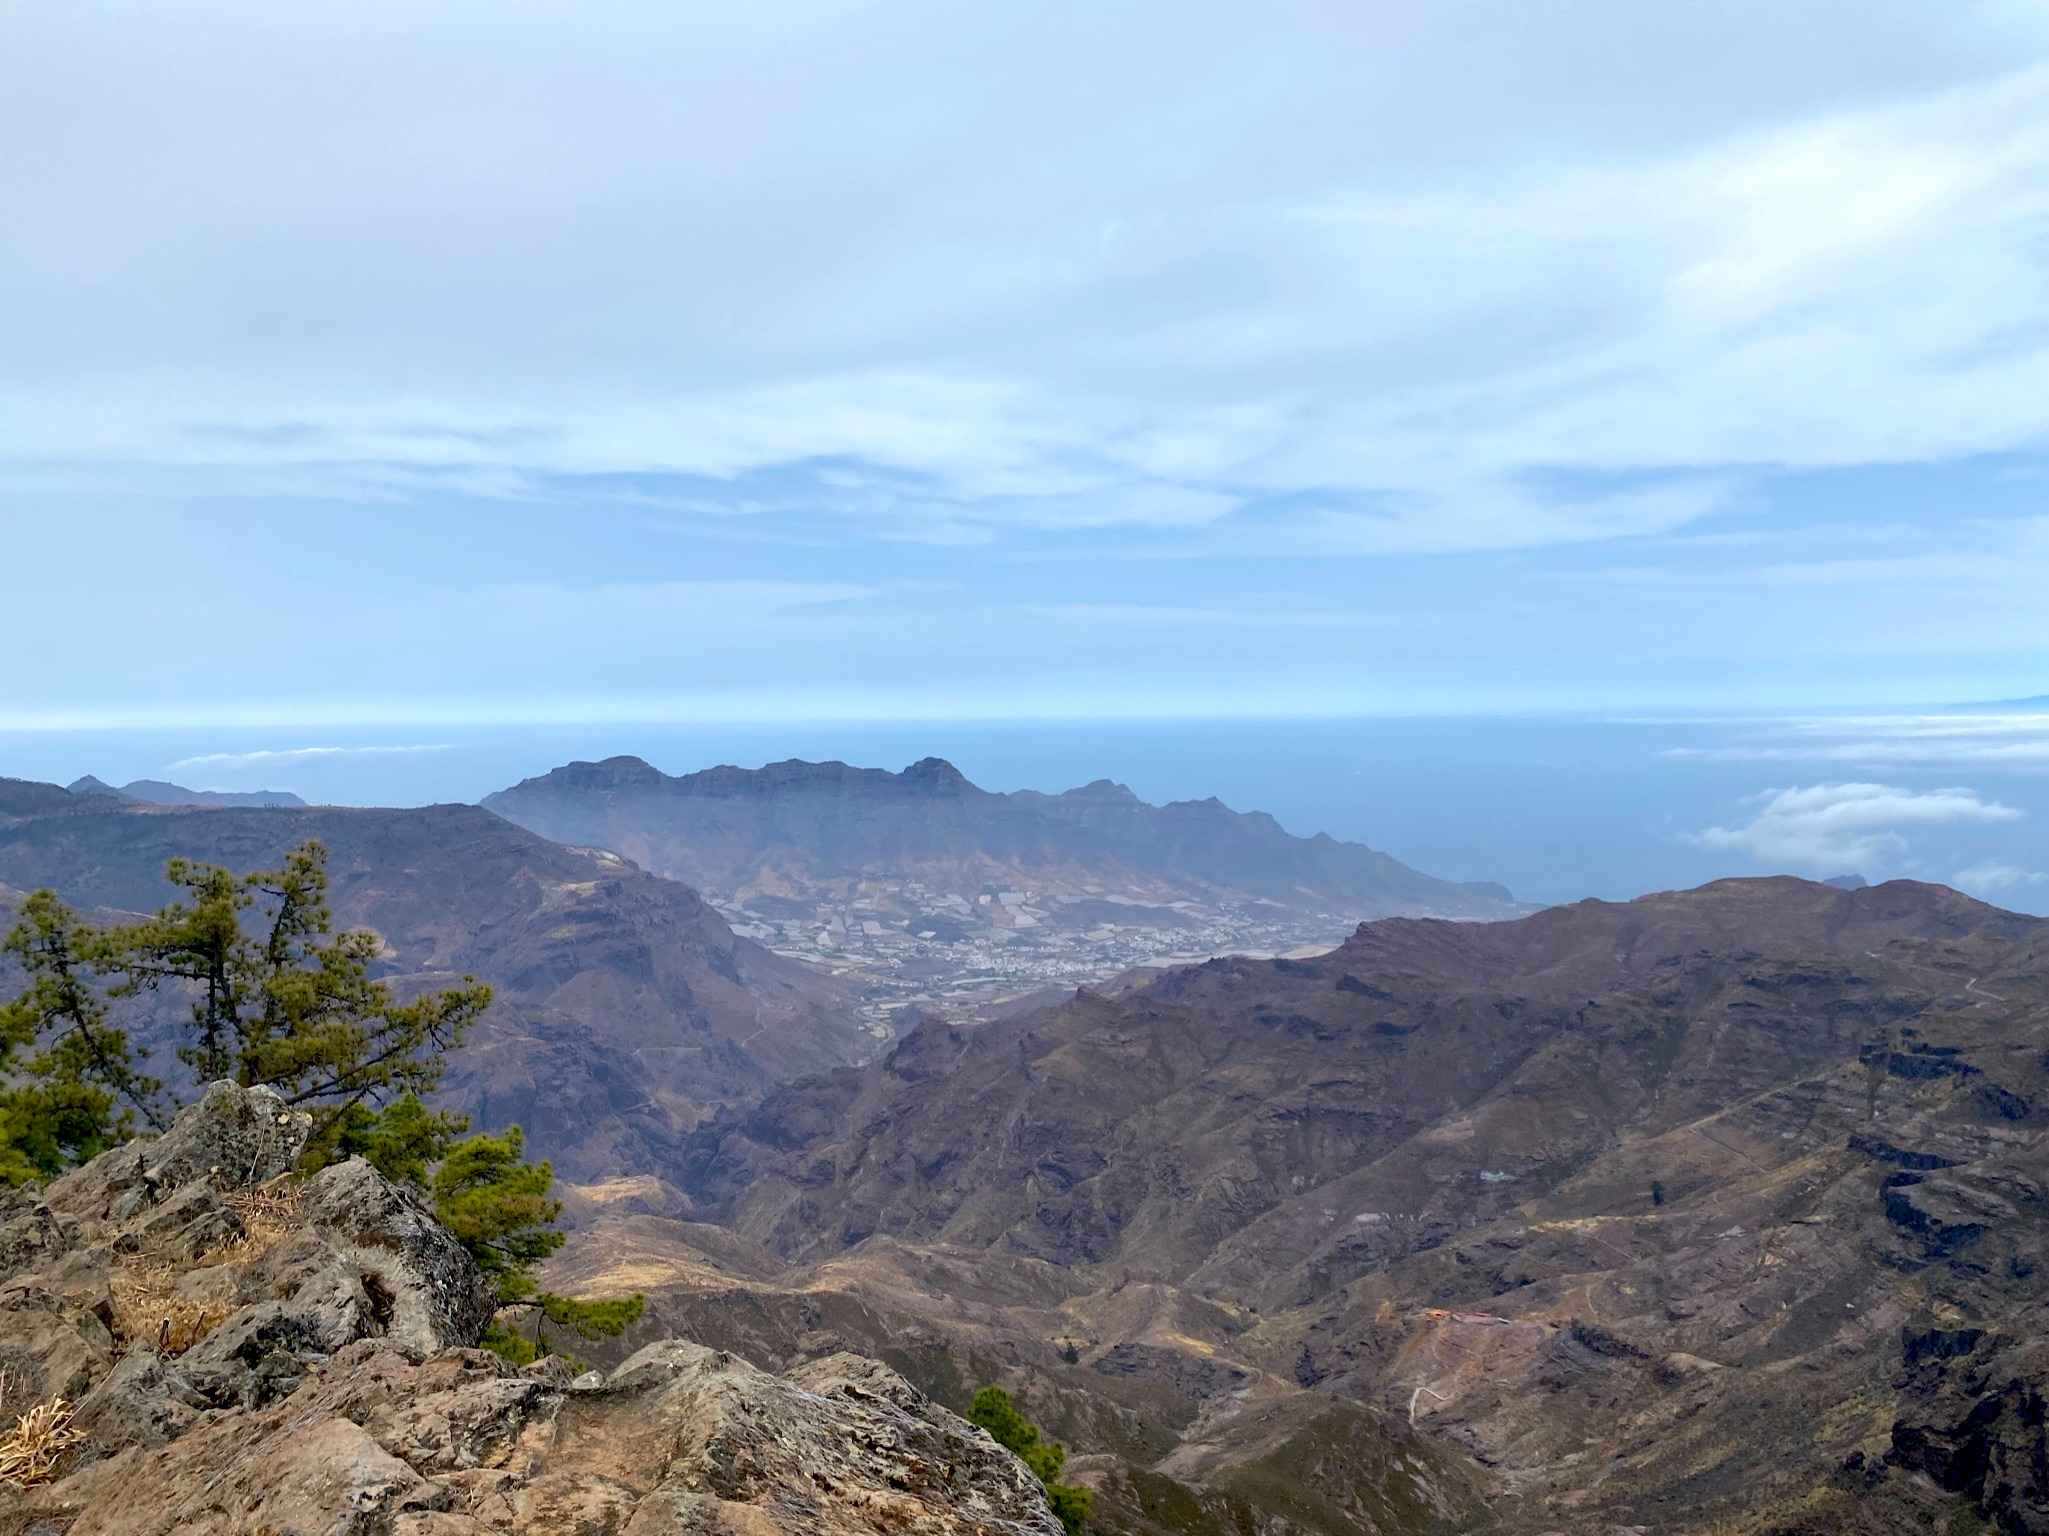 Ausblick bei der Wanderung zum Altavista